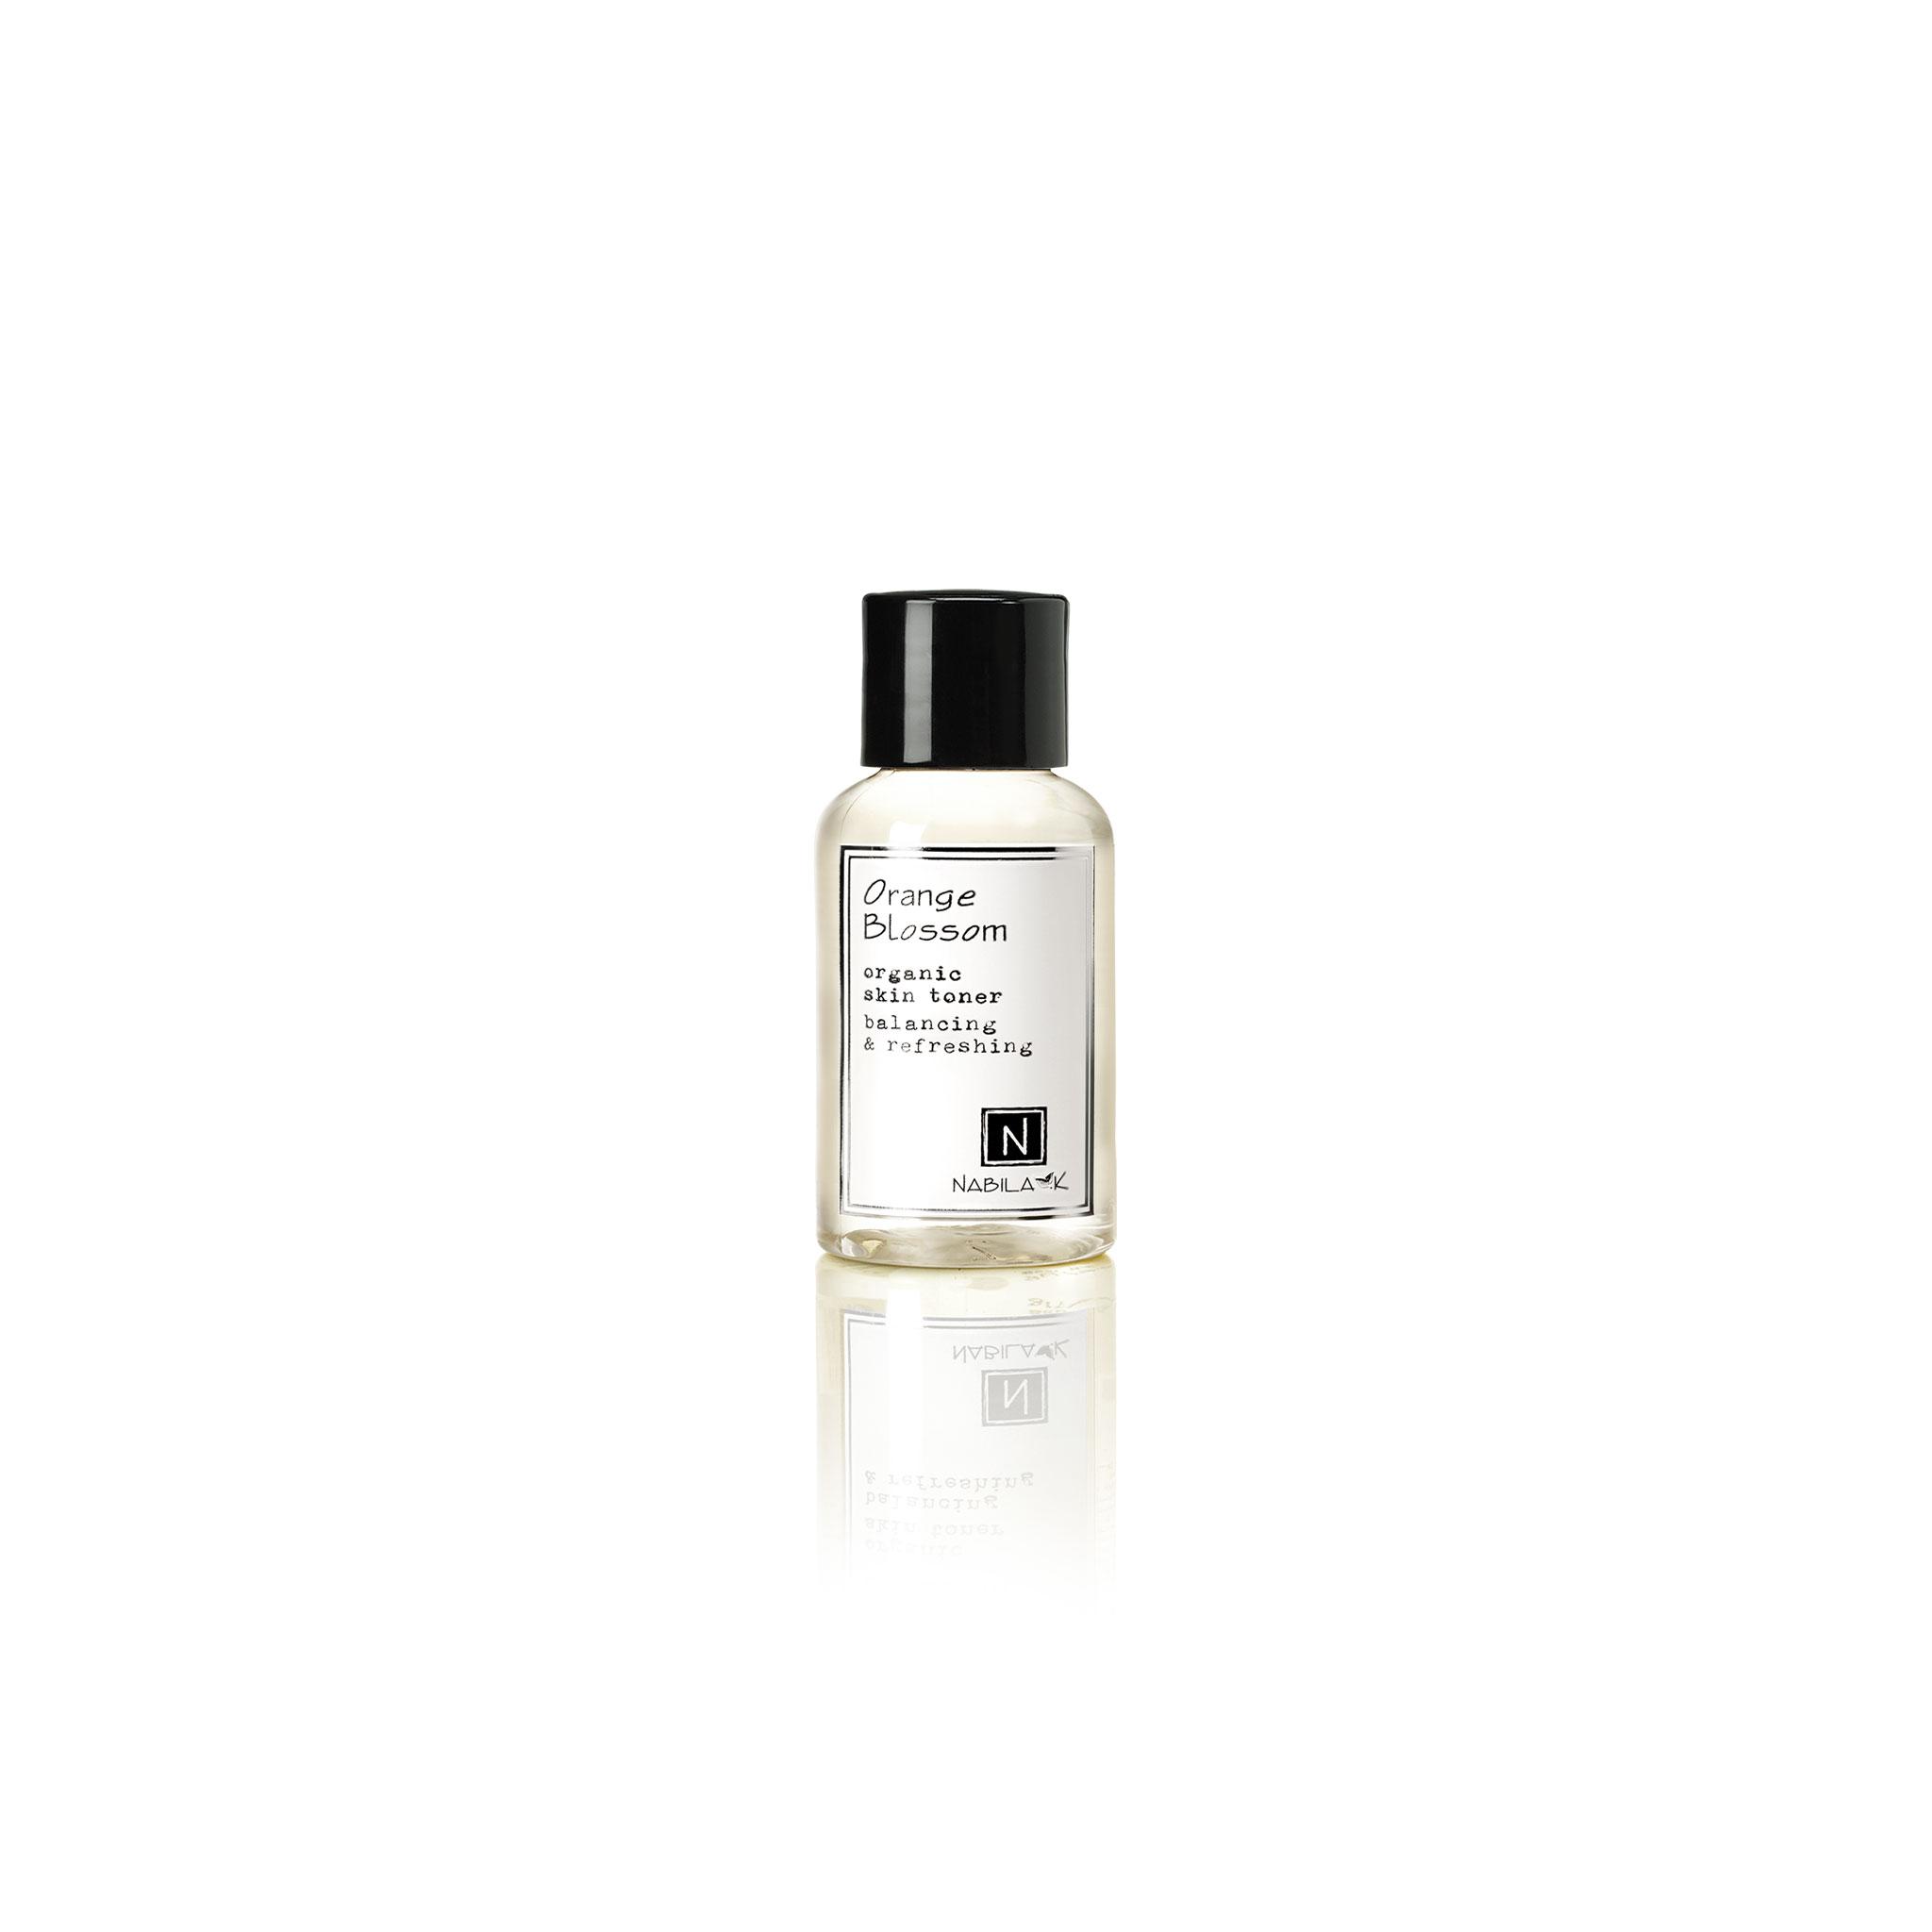 2.4oz Orange Blossom Organic Skin Toner Balancing and Refreshing